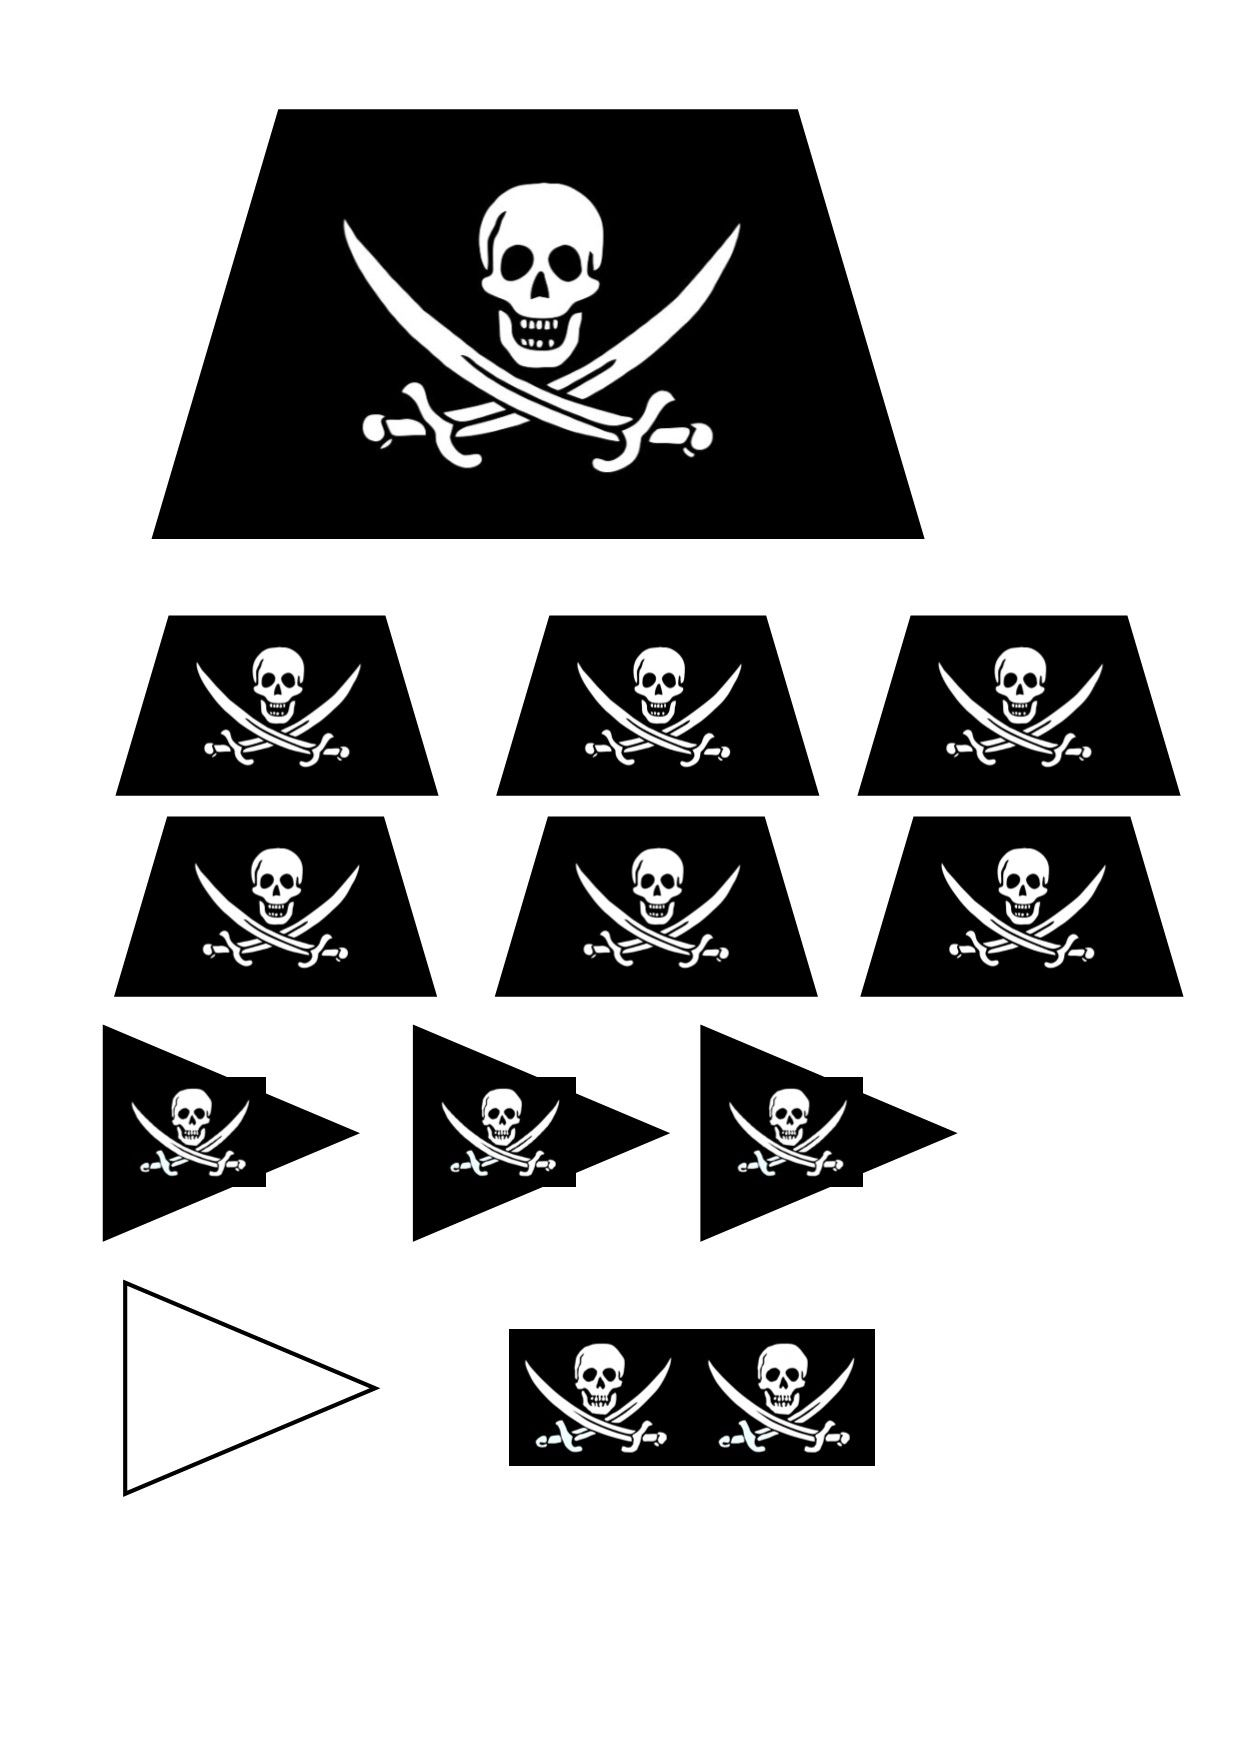 Drapeaux Et Voiles Anniversaire Pirate Drapeau Pirate Pirates Dessin